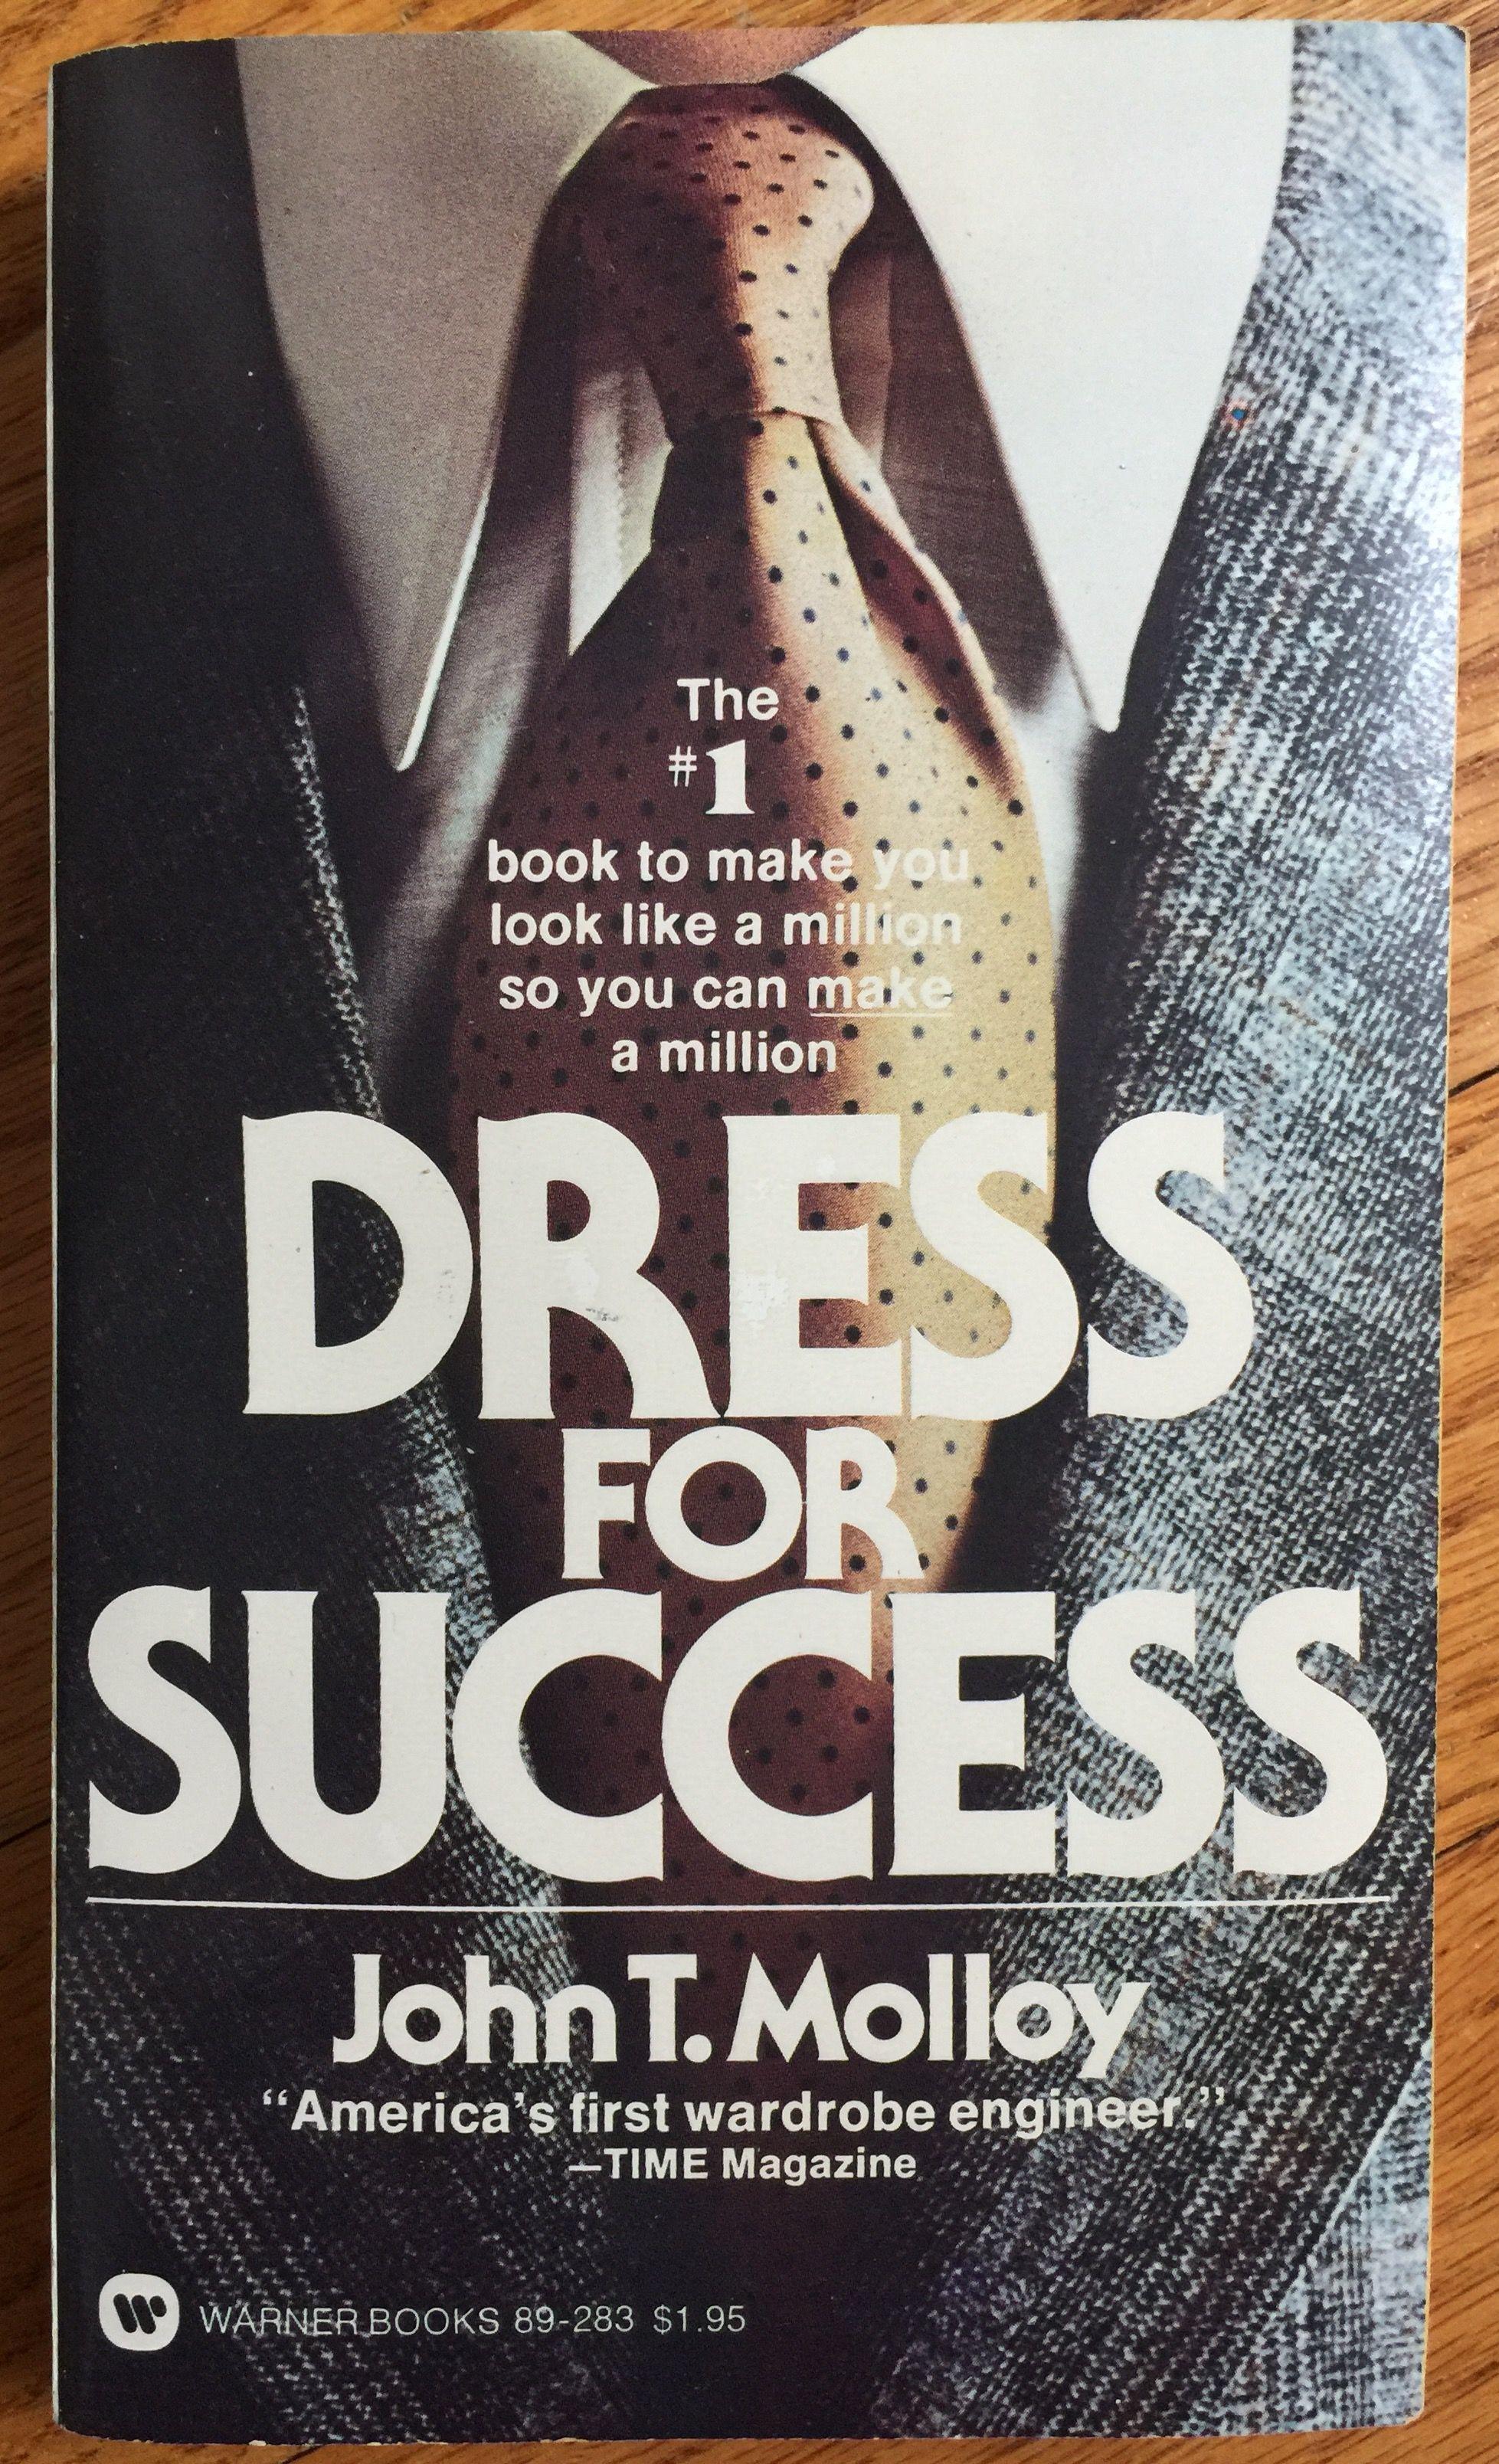 Dress for success Джона Т. Моллоя